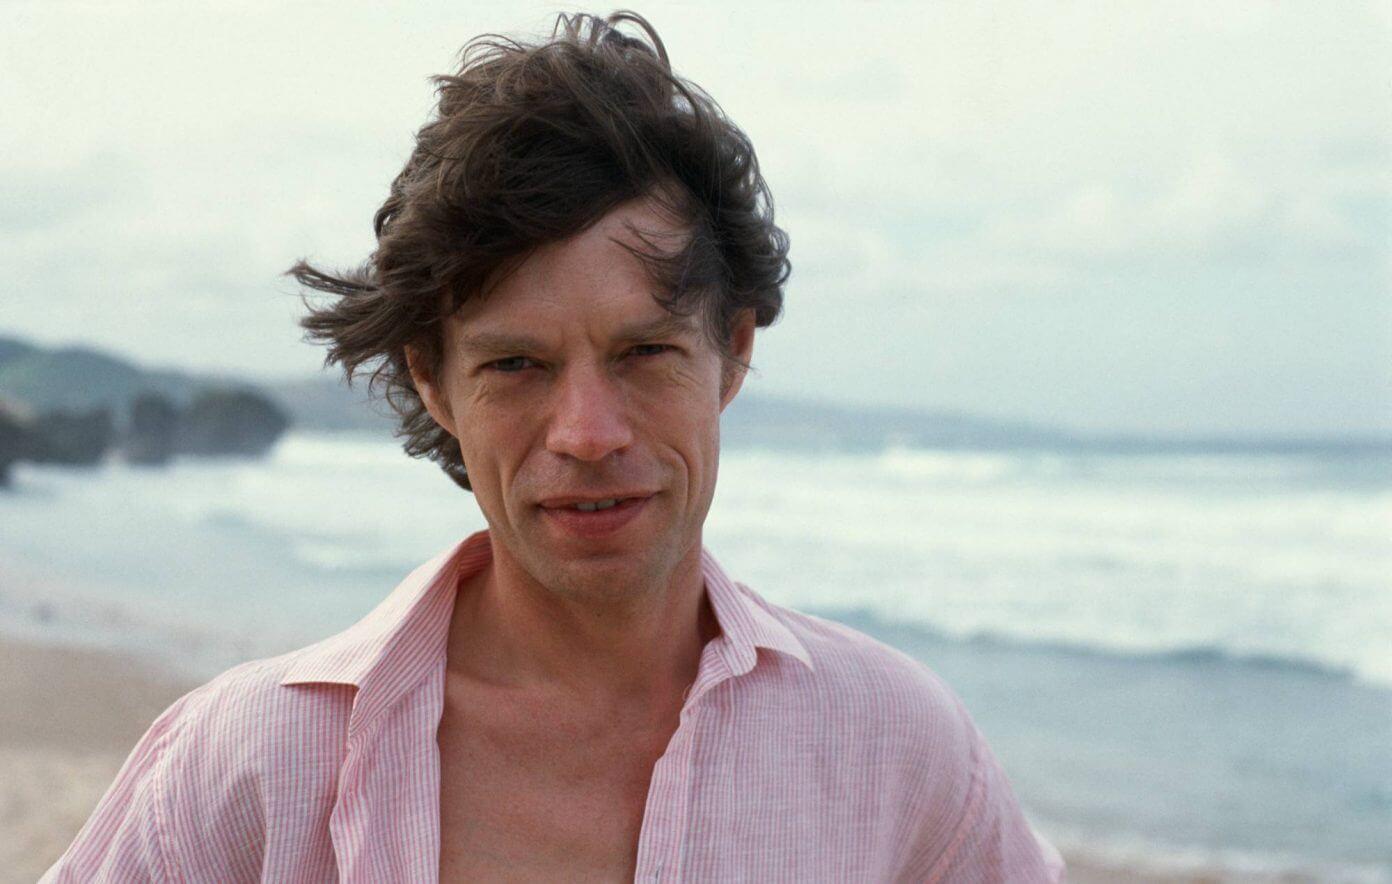 Mick Jagger autobiography